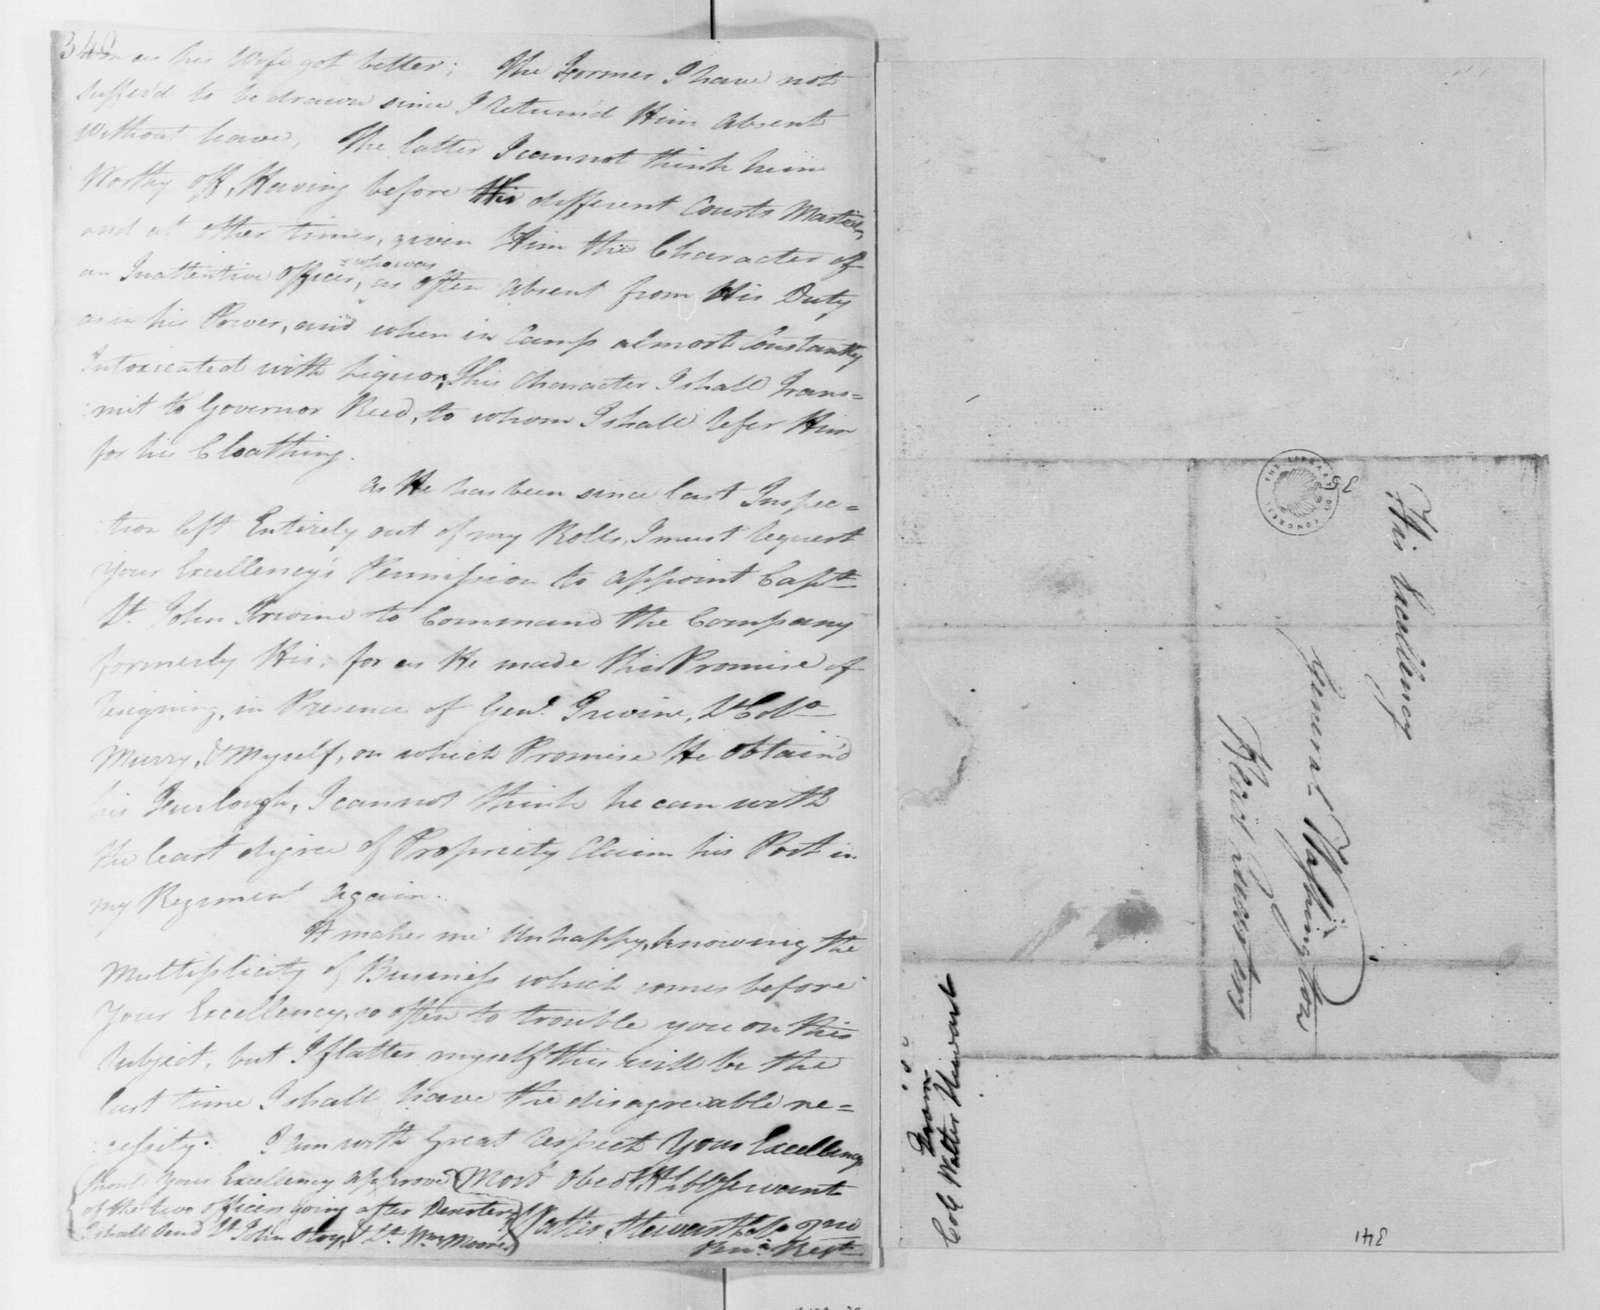 George Washington Papers, Series 4, General Correspondence: Walter Stewart to George Washington, February 16, 1780